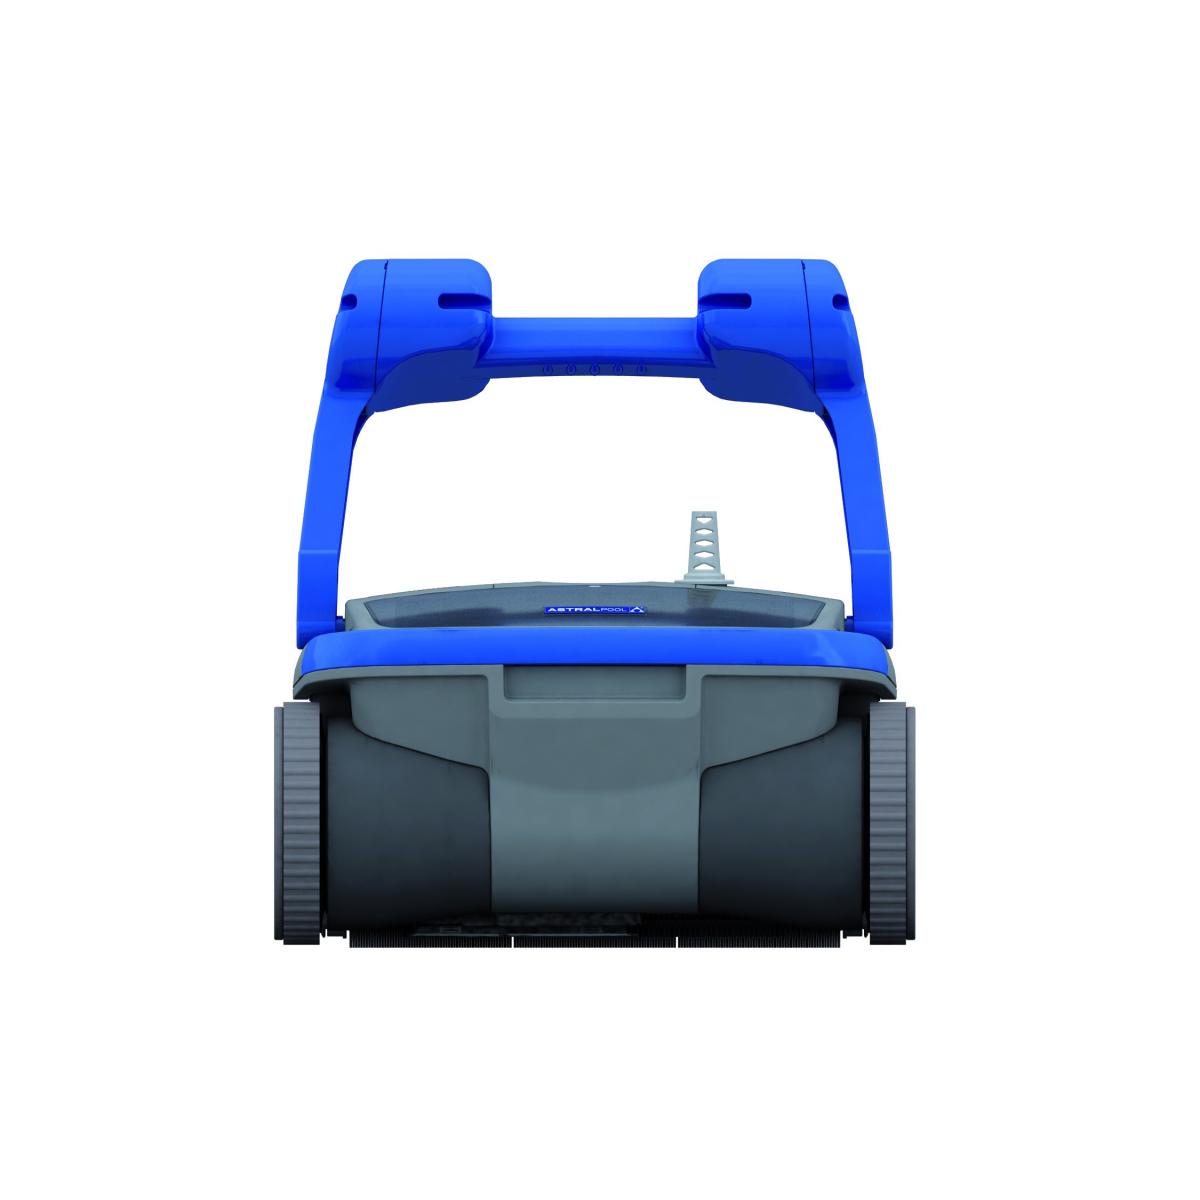 Robot Limpiafondos R5 para suelo